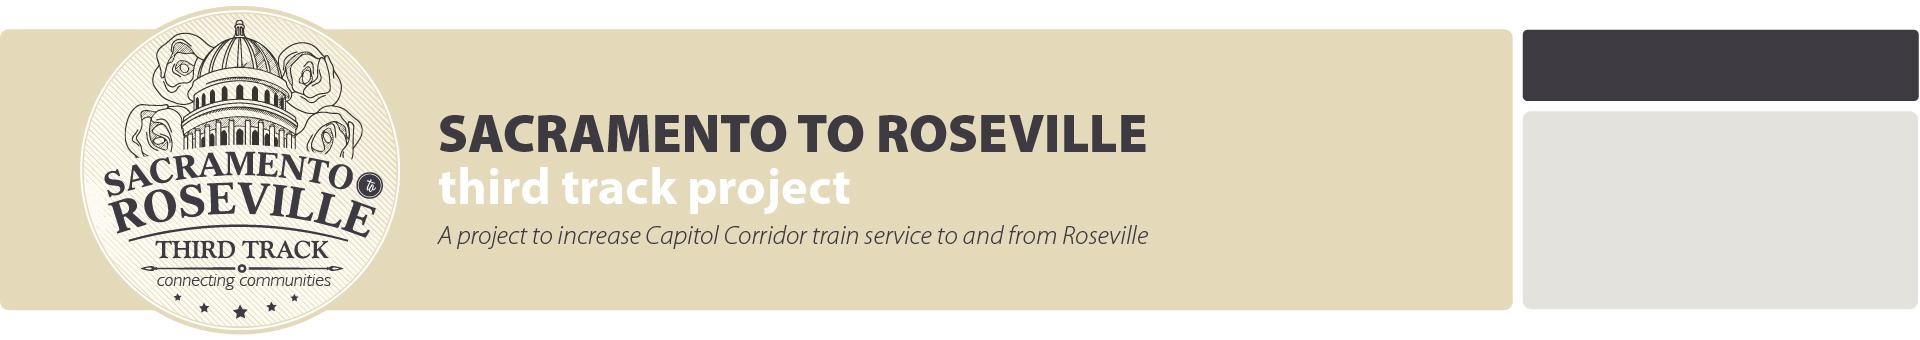 Sacramento to Roseville Third Track